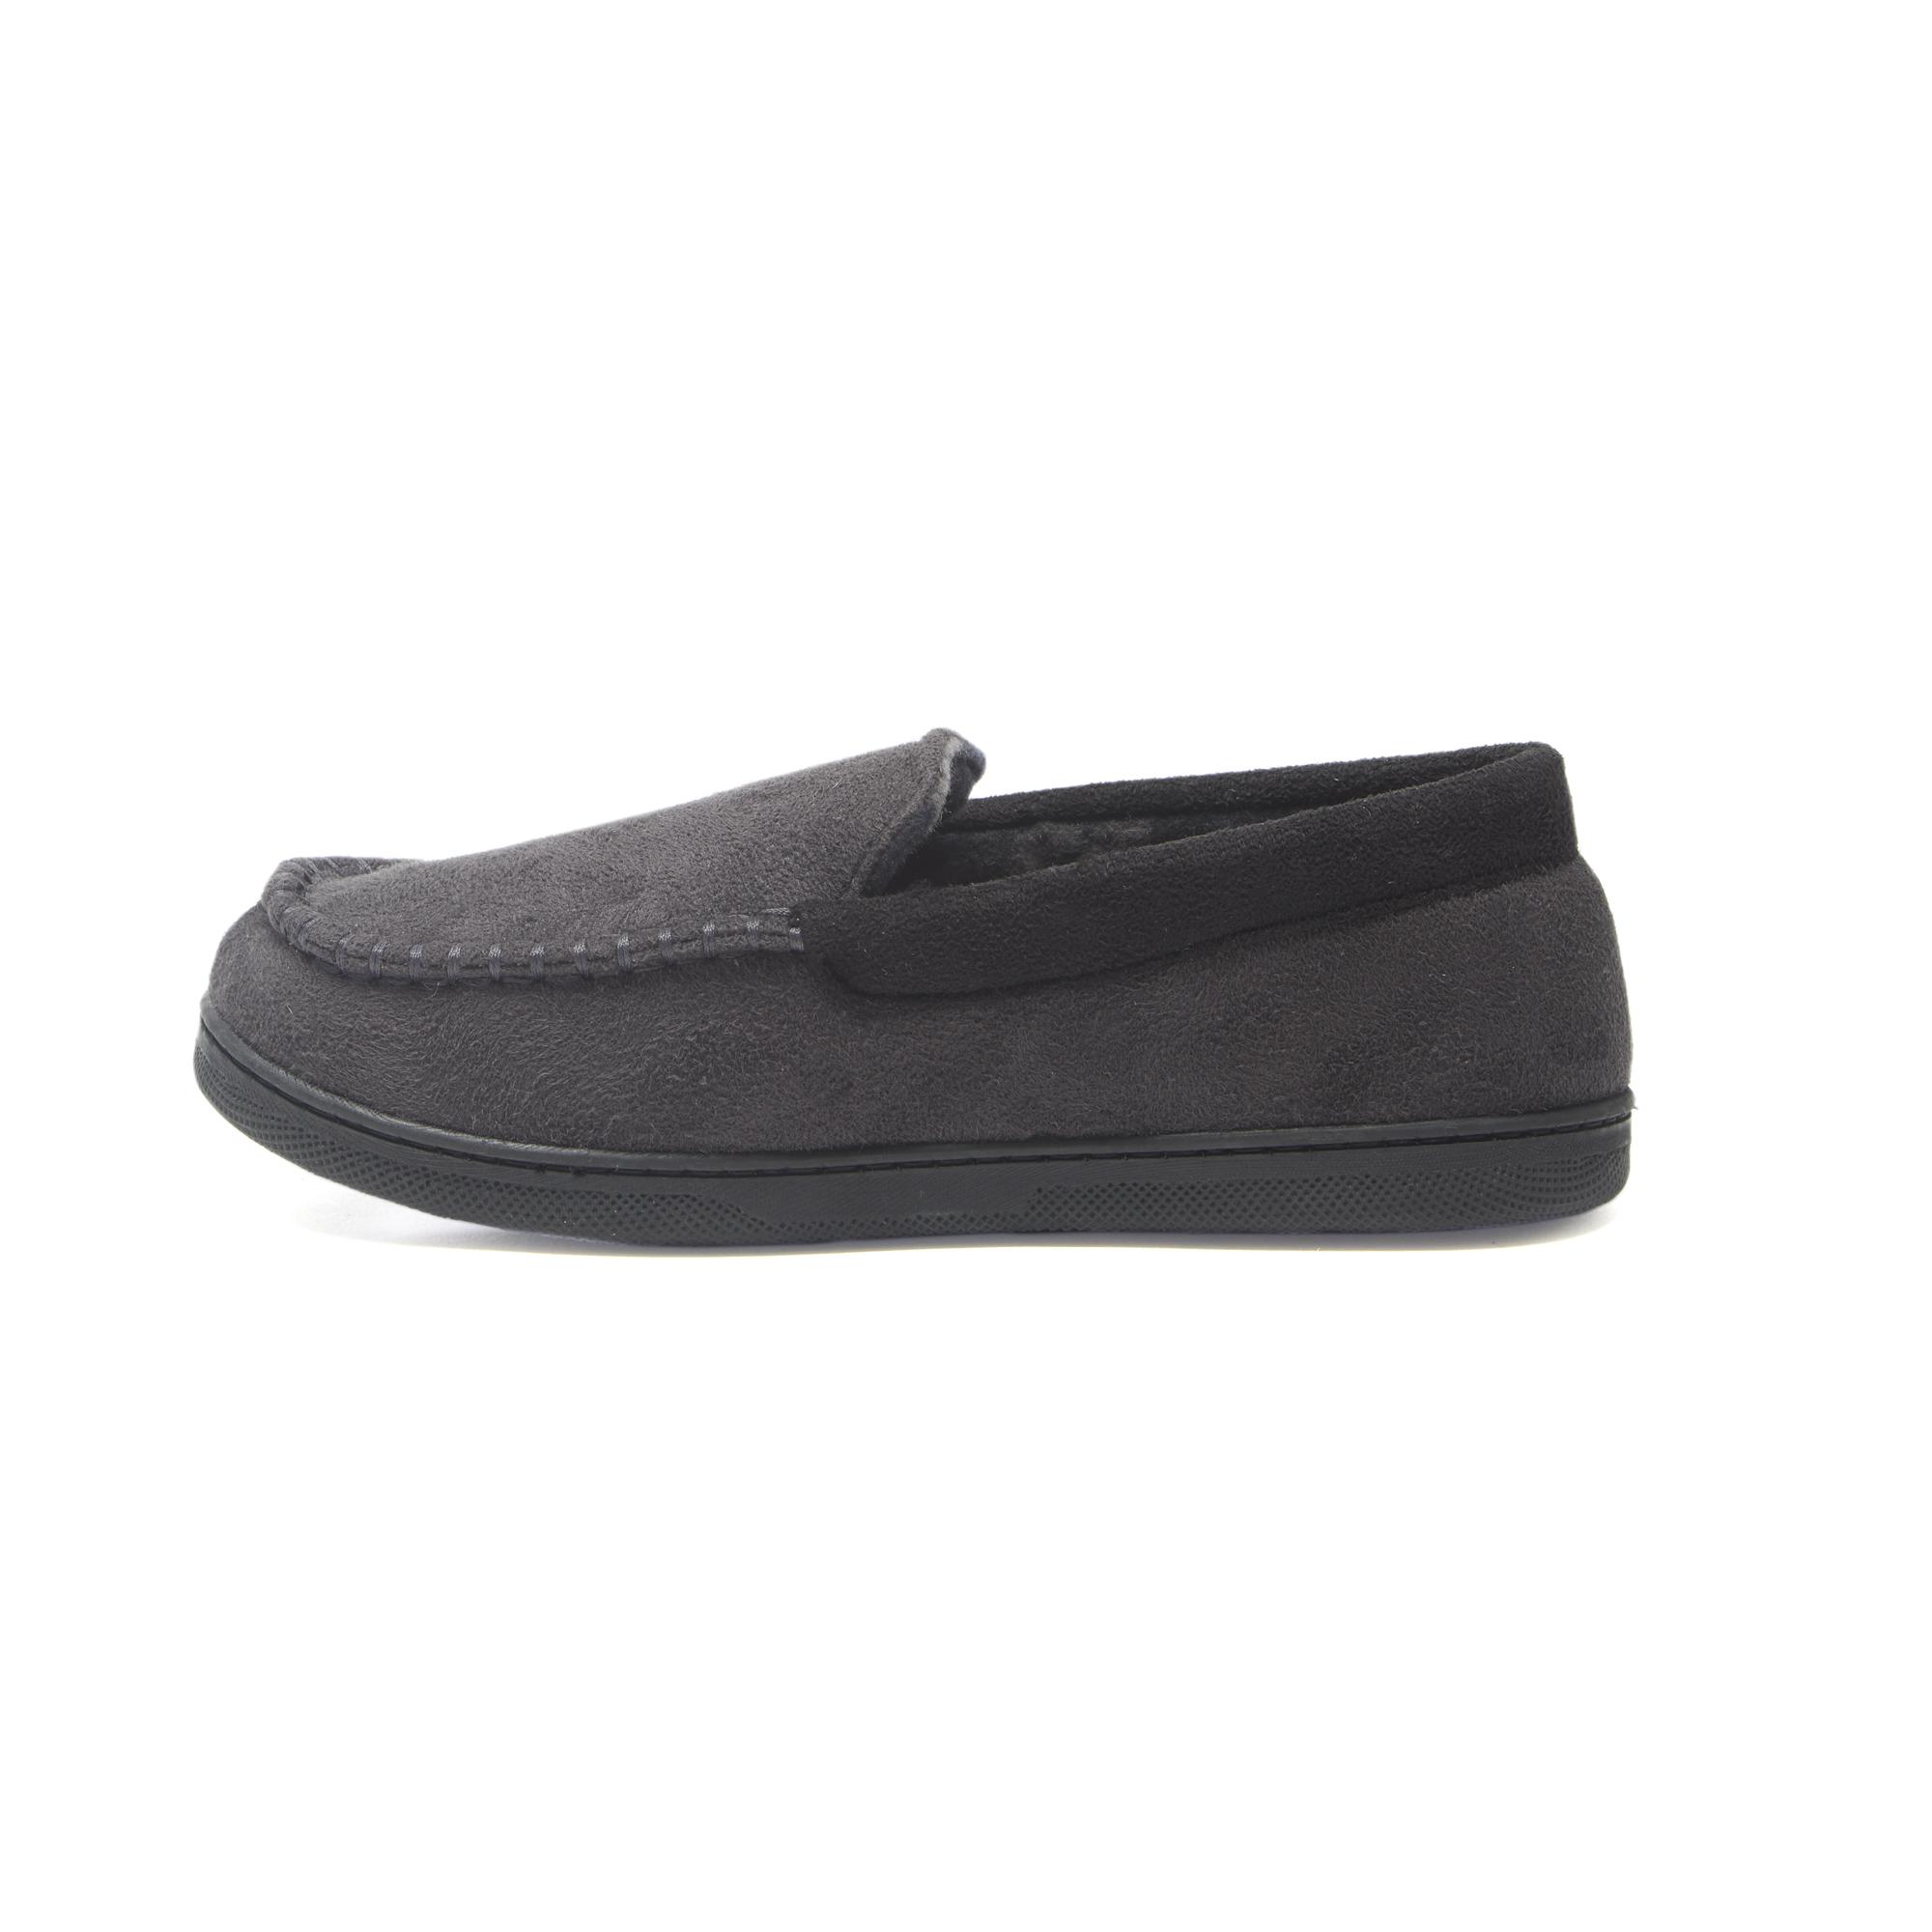 Hanes Boy/'s Slipper Moccasin House Shoe With  Indoor Outdoor Memory Foam Sole